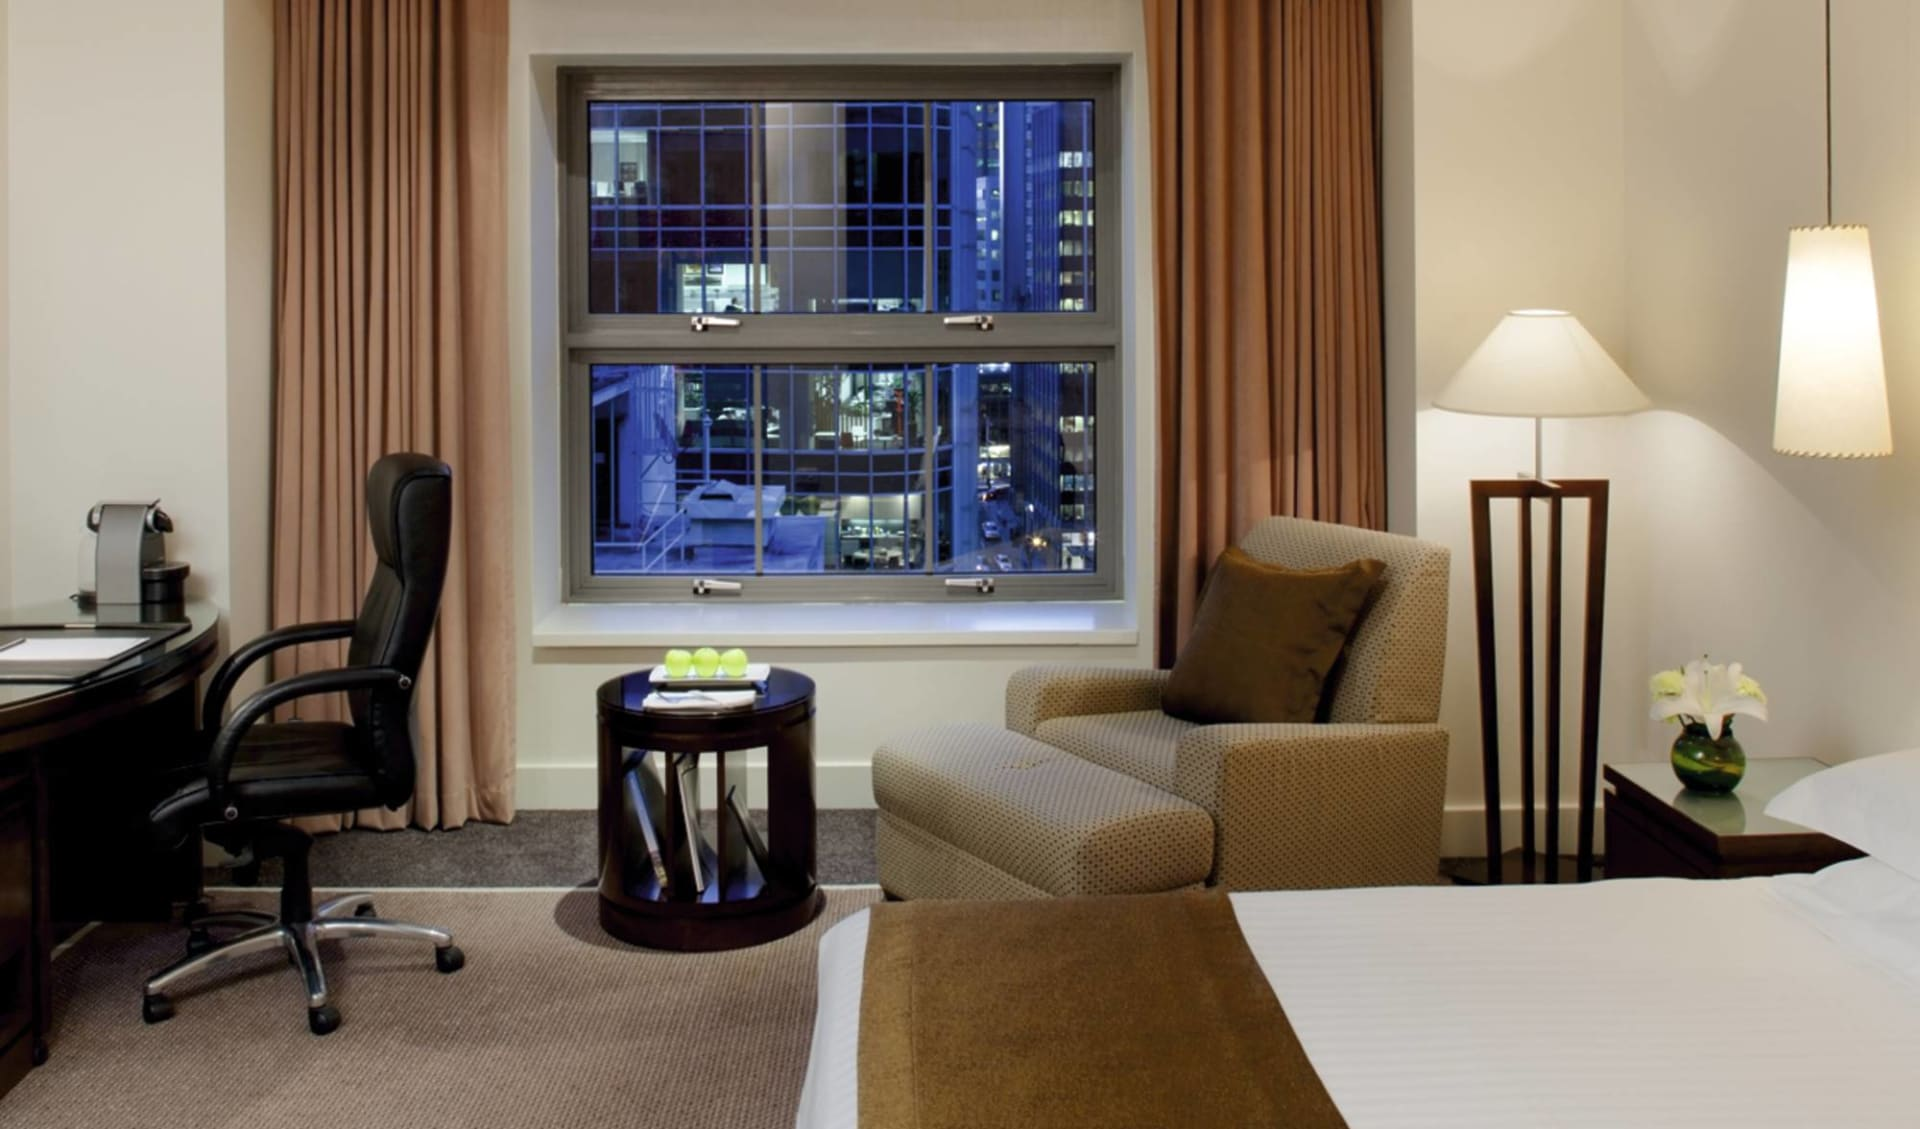 Four Seasons Hotel Sydney:  Four Seasons Hotel Sydney - Business Class Room